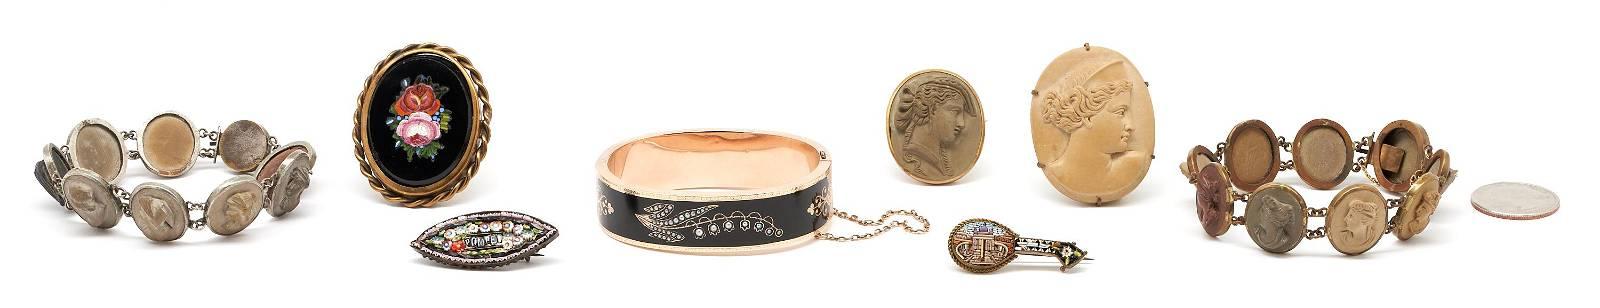 14K Enameled Bracelet, 4 Basalt Cameo and 3 Micro